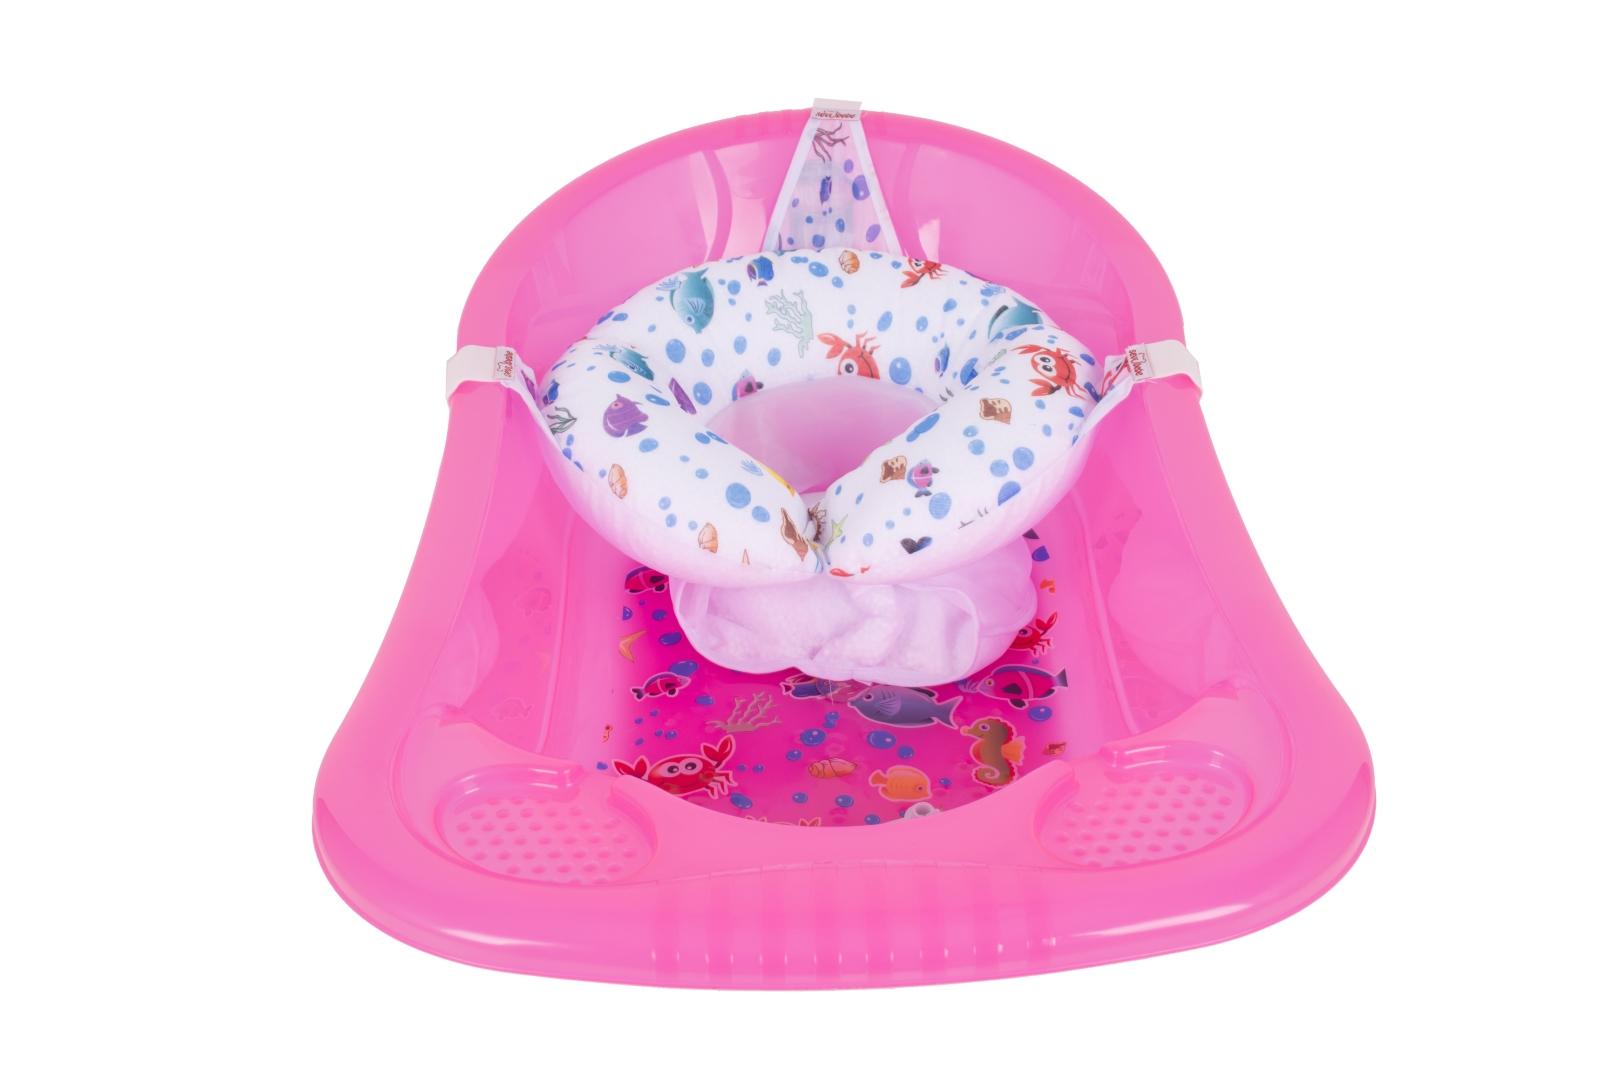 Sevi Bebe Oturaklı Bebek Banyo Filesi - Akvaryum Desen